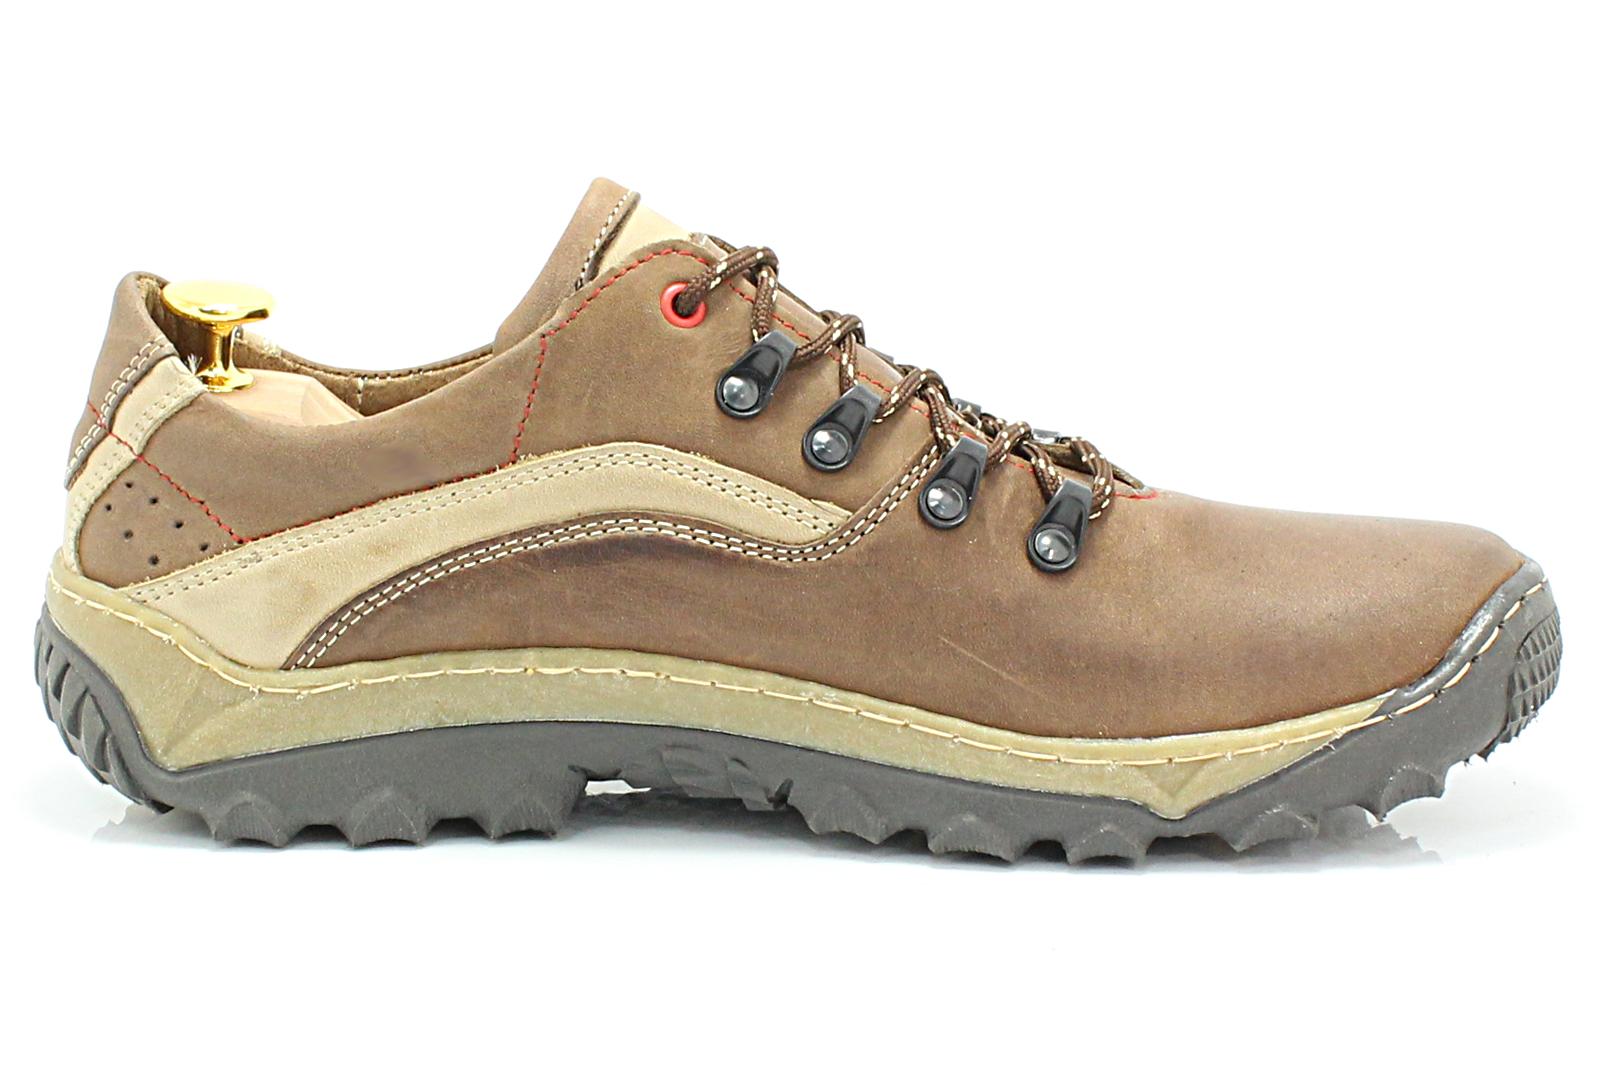 325fb00d KENT 268 BRĄZ - Polskie solidne buty trekkingowe ze skóry naturalnej ...